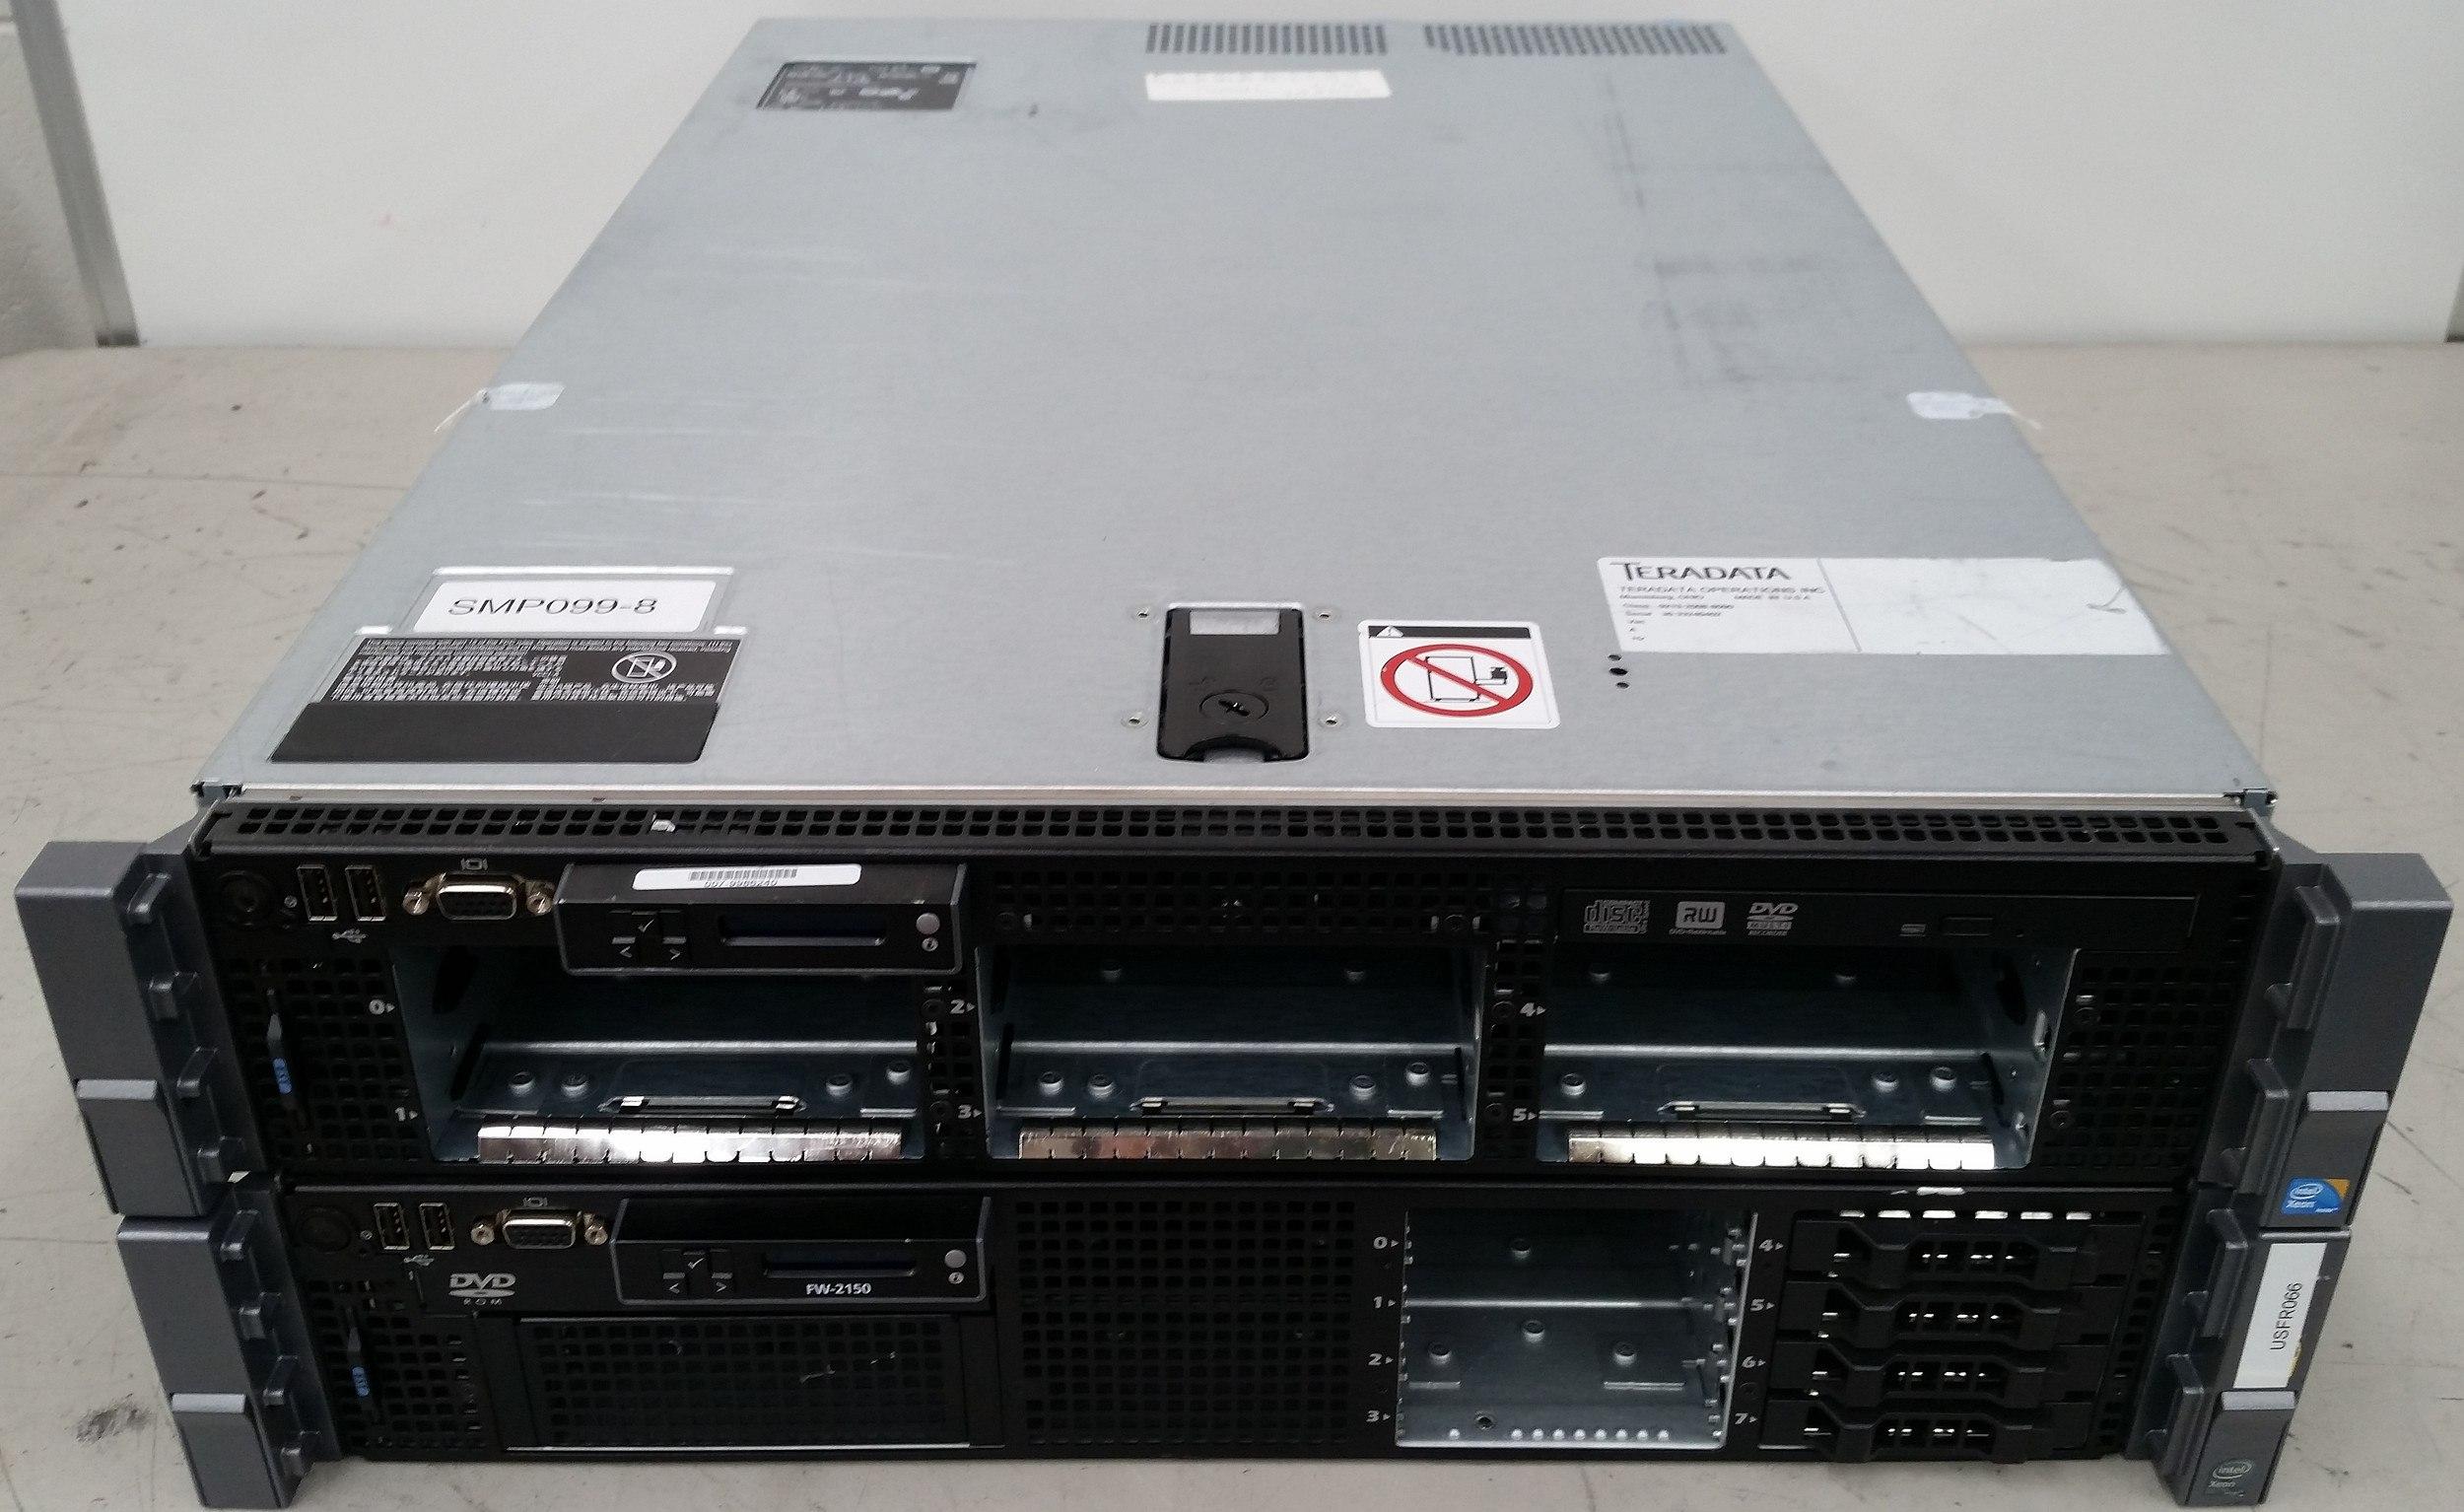 McAfee FW-2150 & Teradata SMP099-8 (Dell R710) 2 RU Servers